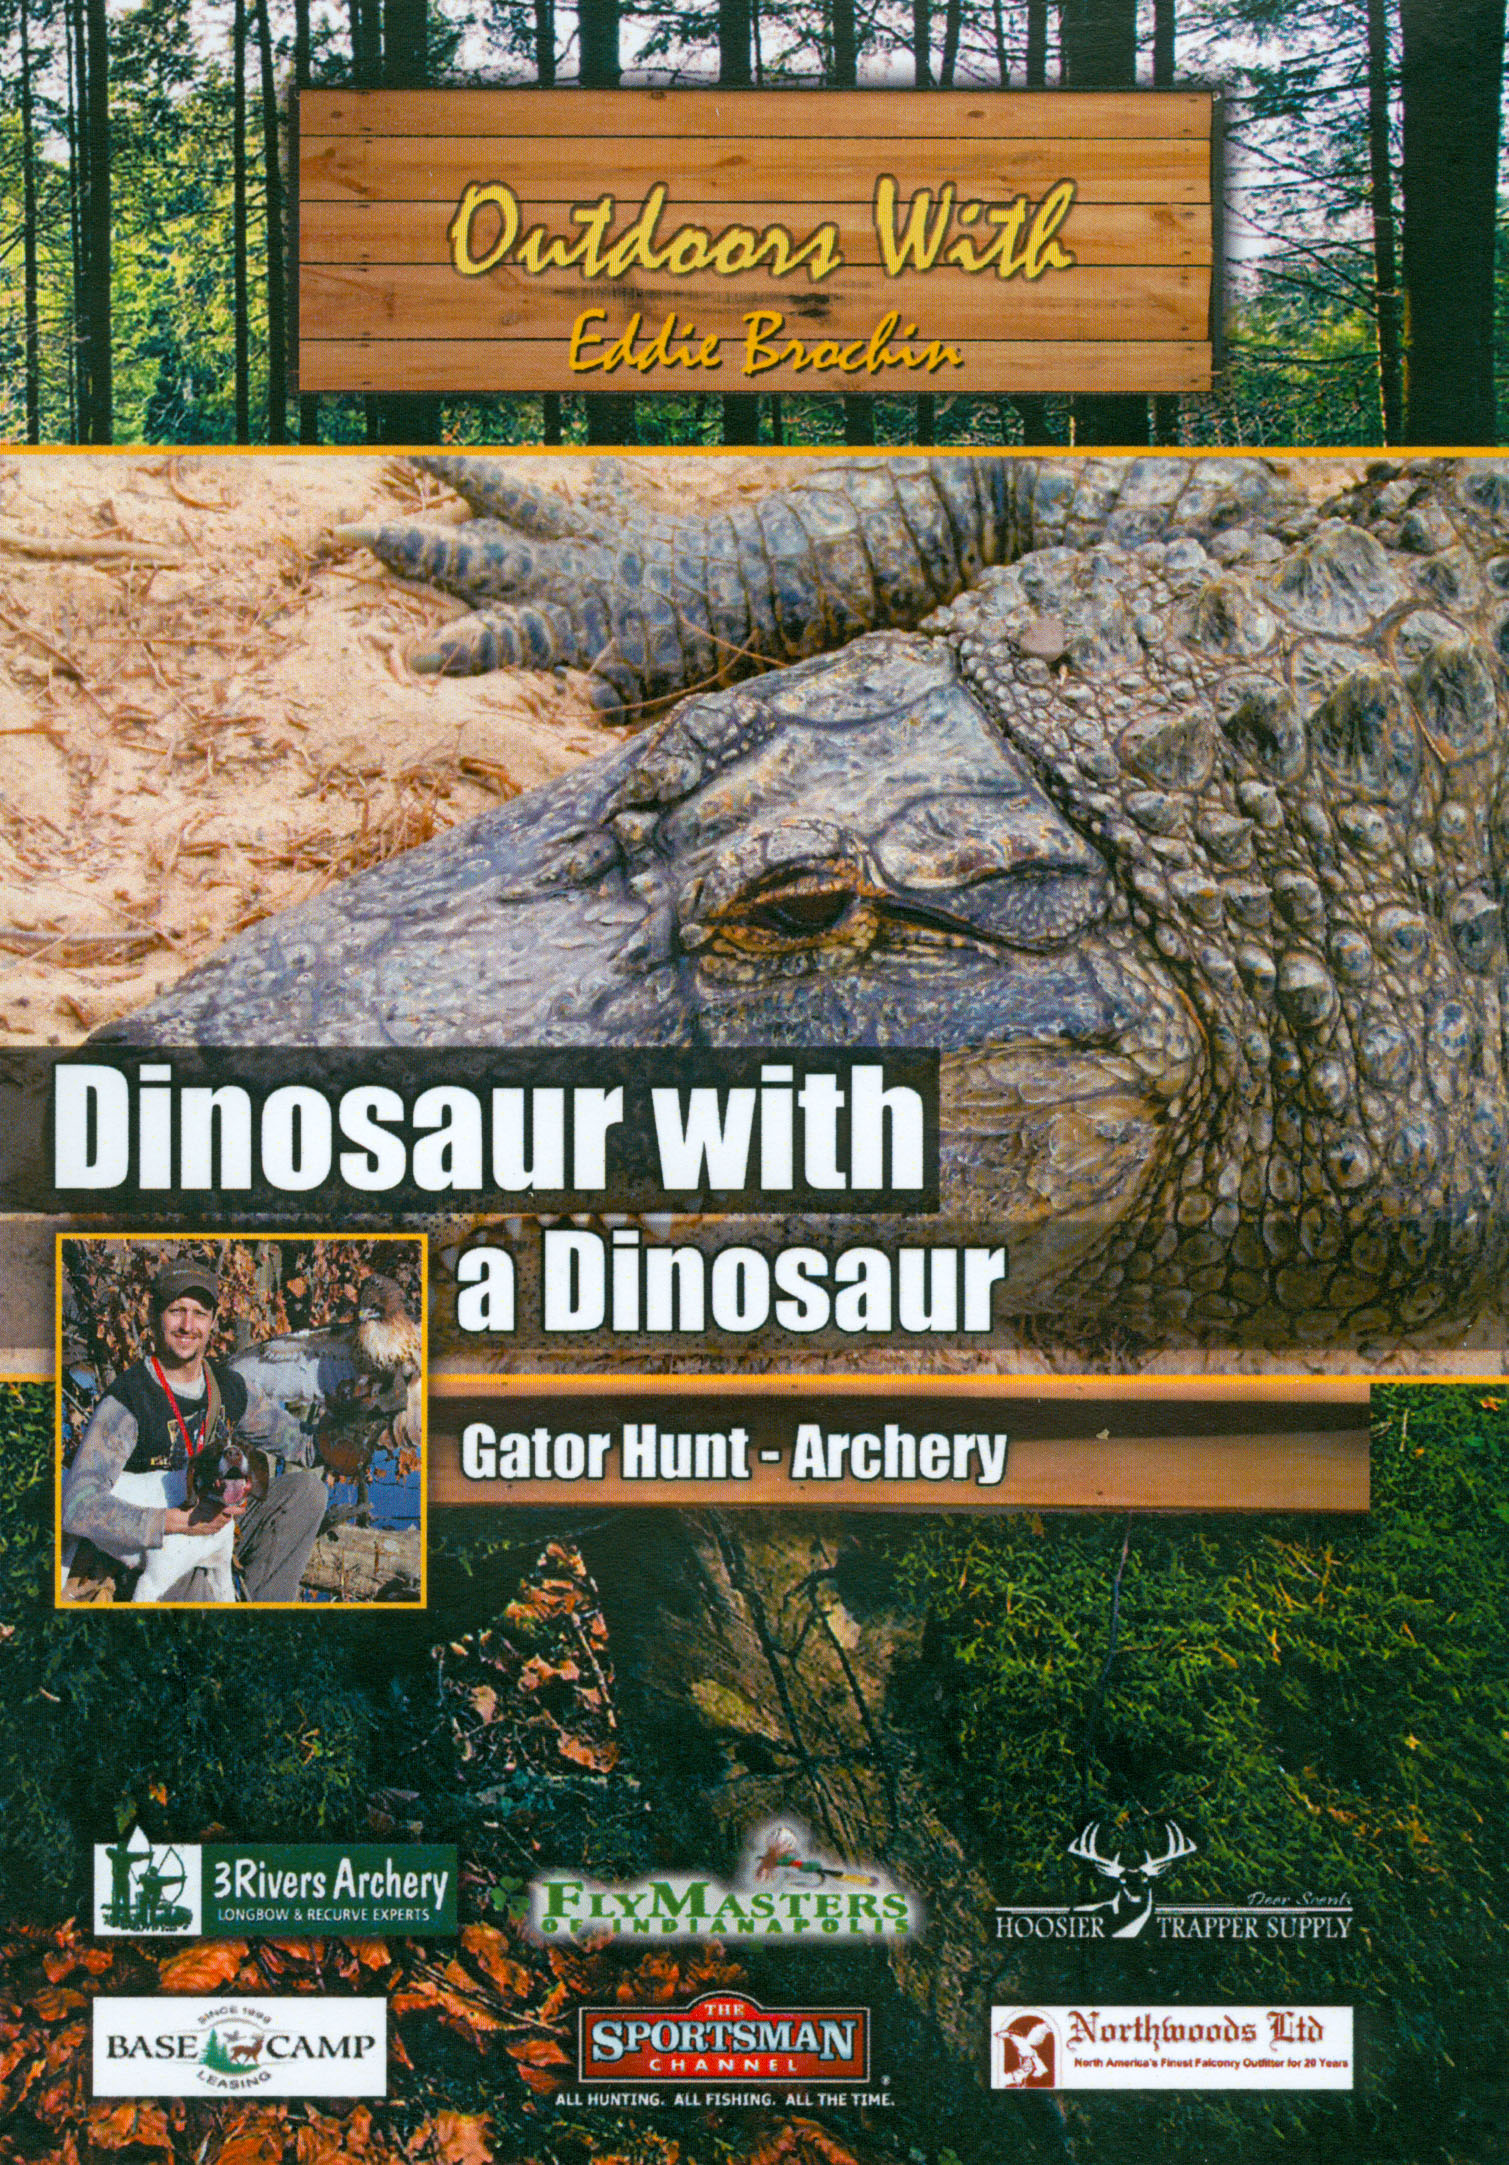 Outdoors With Eddie Brochin: Dinosaur With a Dinosaur